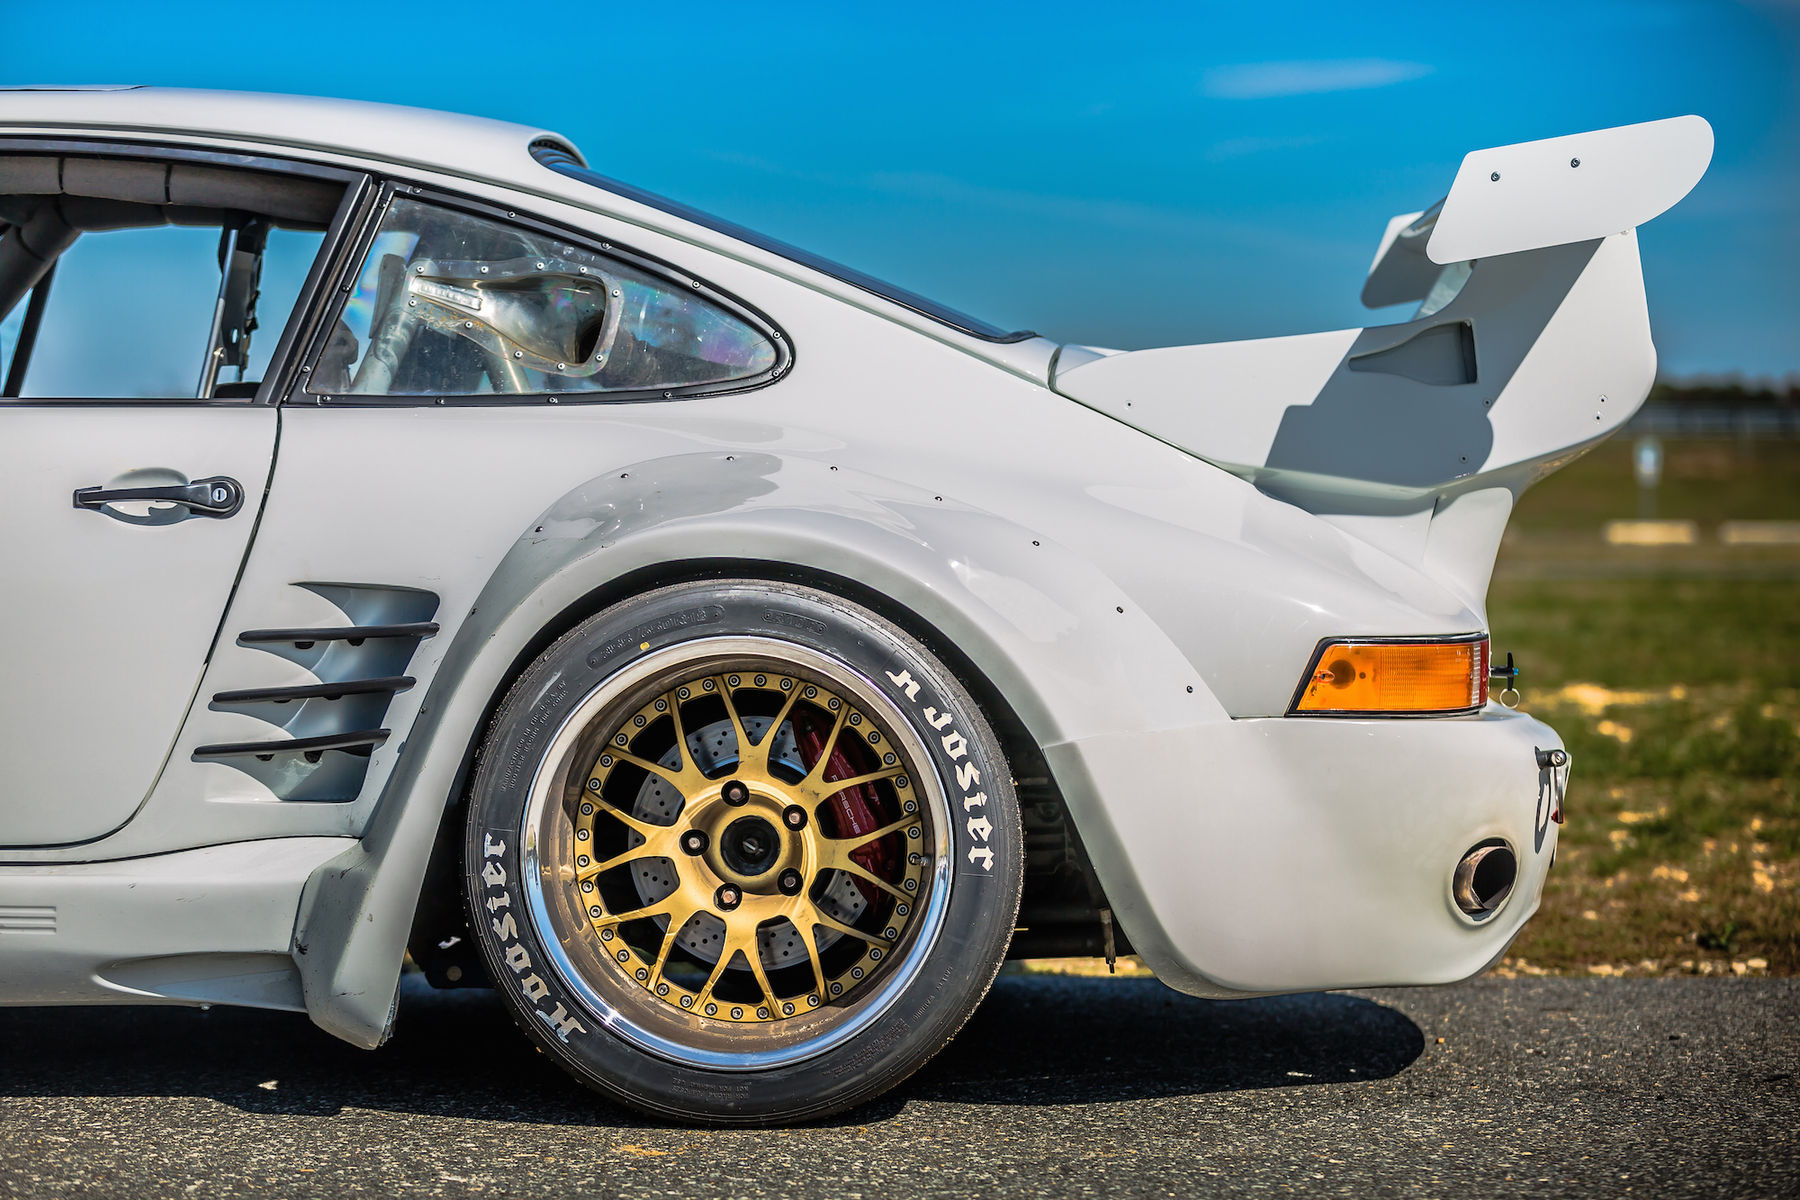 1983 Porsche 911 | Mick Cote's Porsche 911 Turbo Slant Nose on Forgeline WC3R Wheels